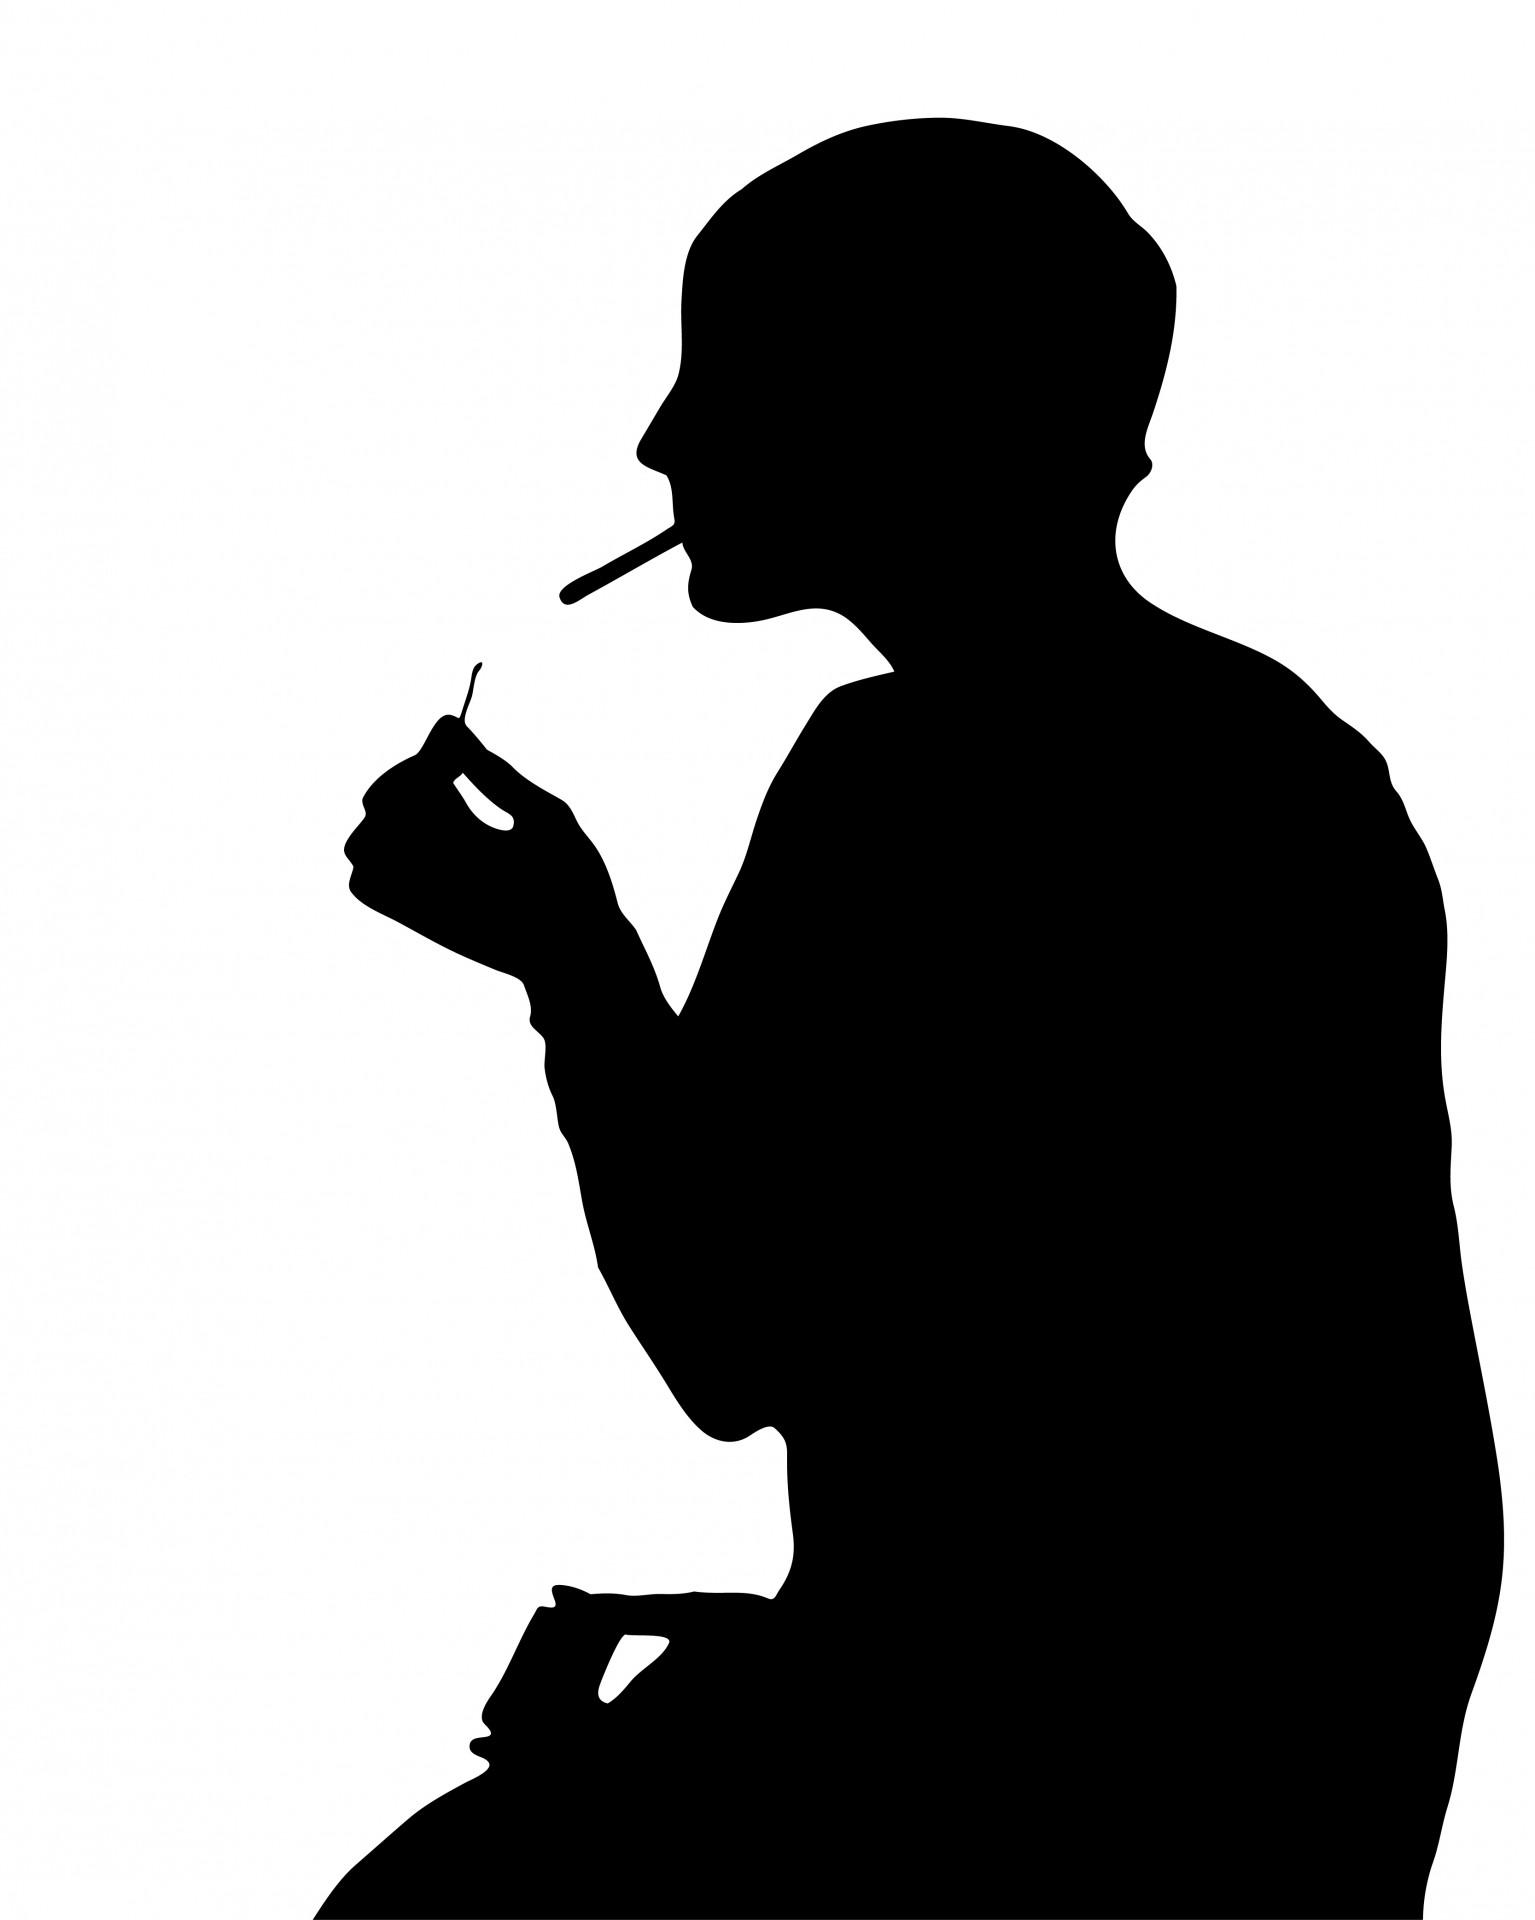 Woman Smoking Silhouette Clipart Free Stock Photo.